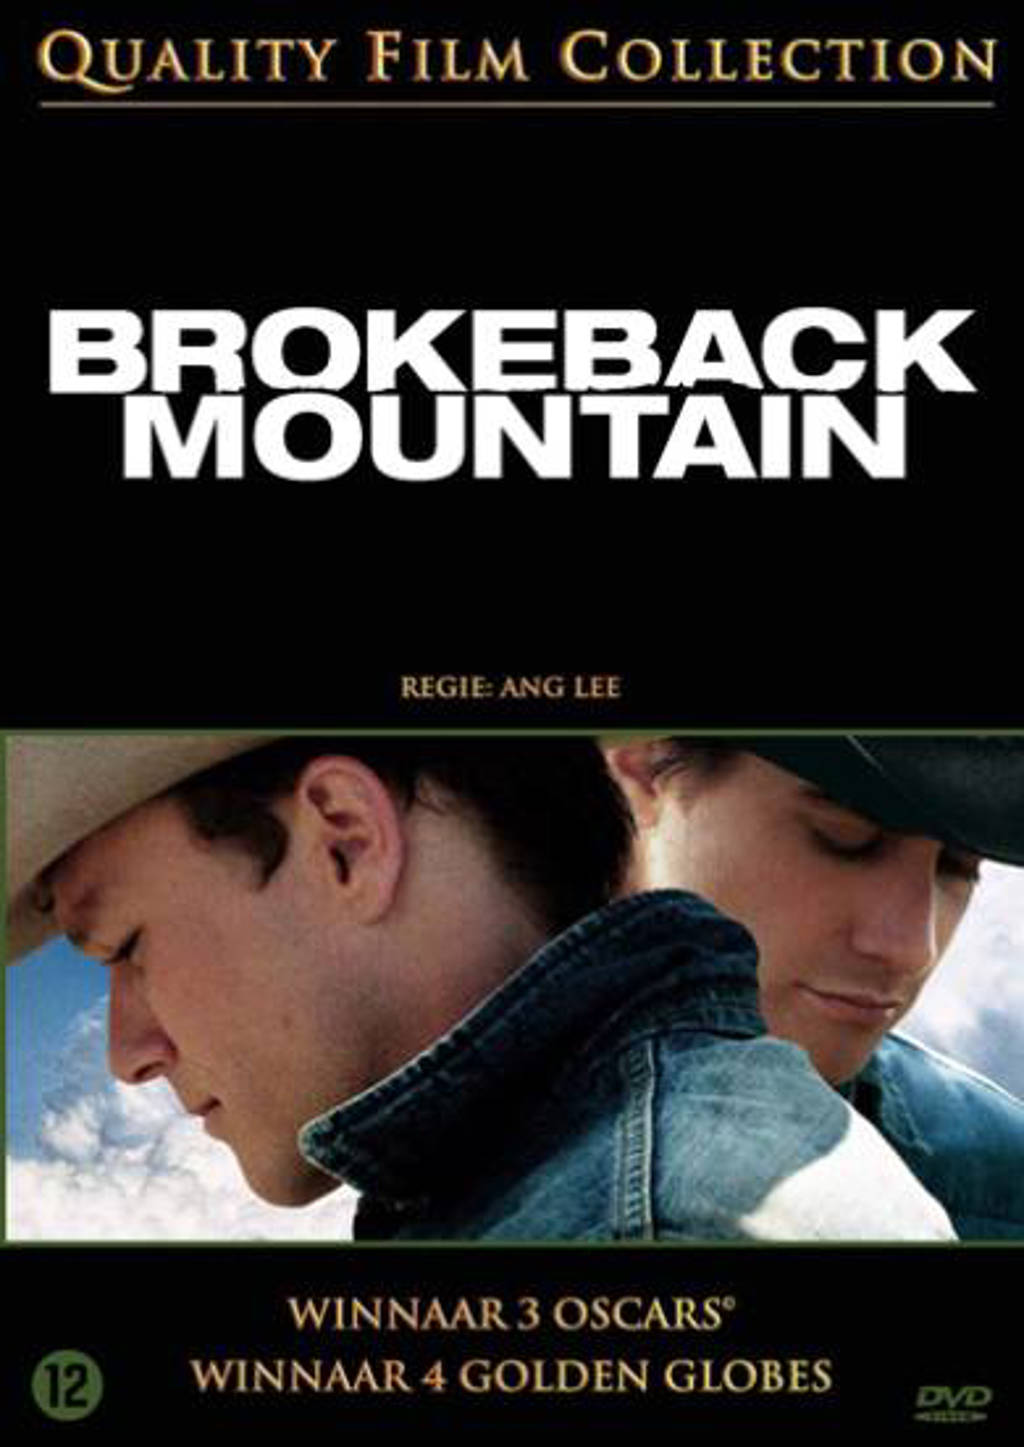 Brokeback mountain (DVD)